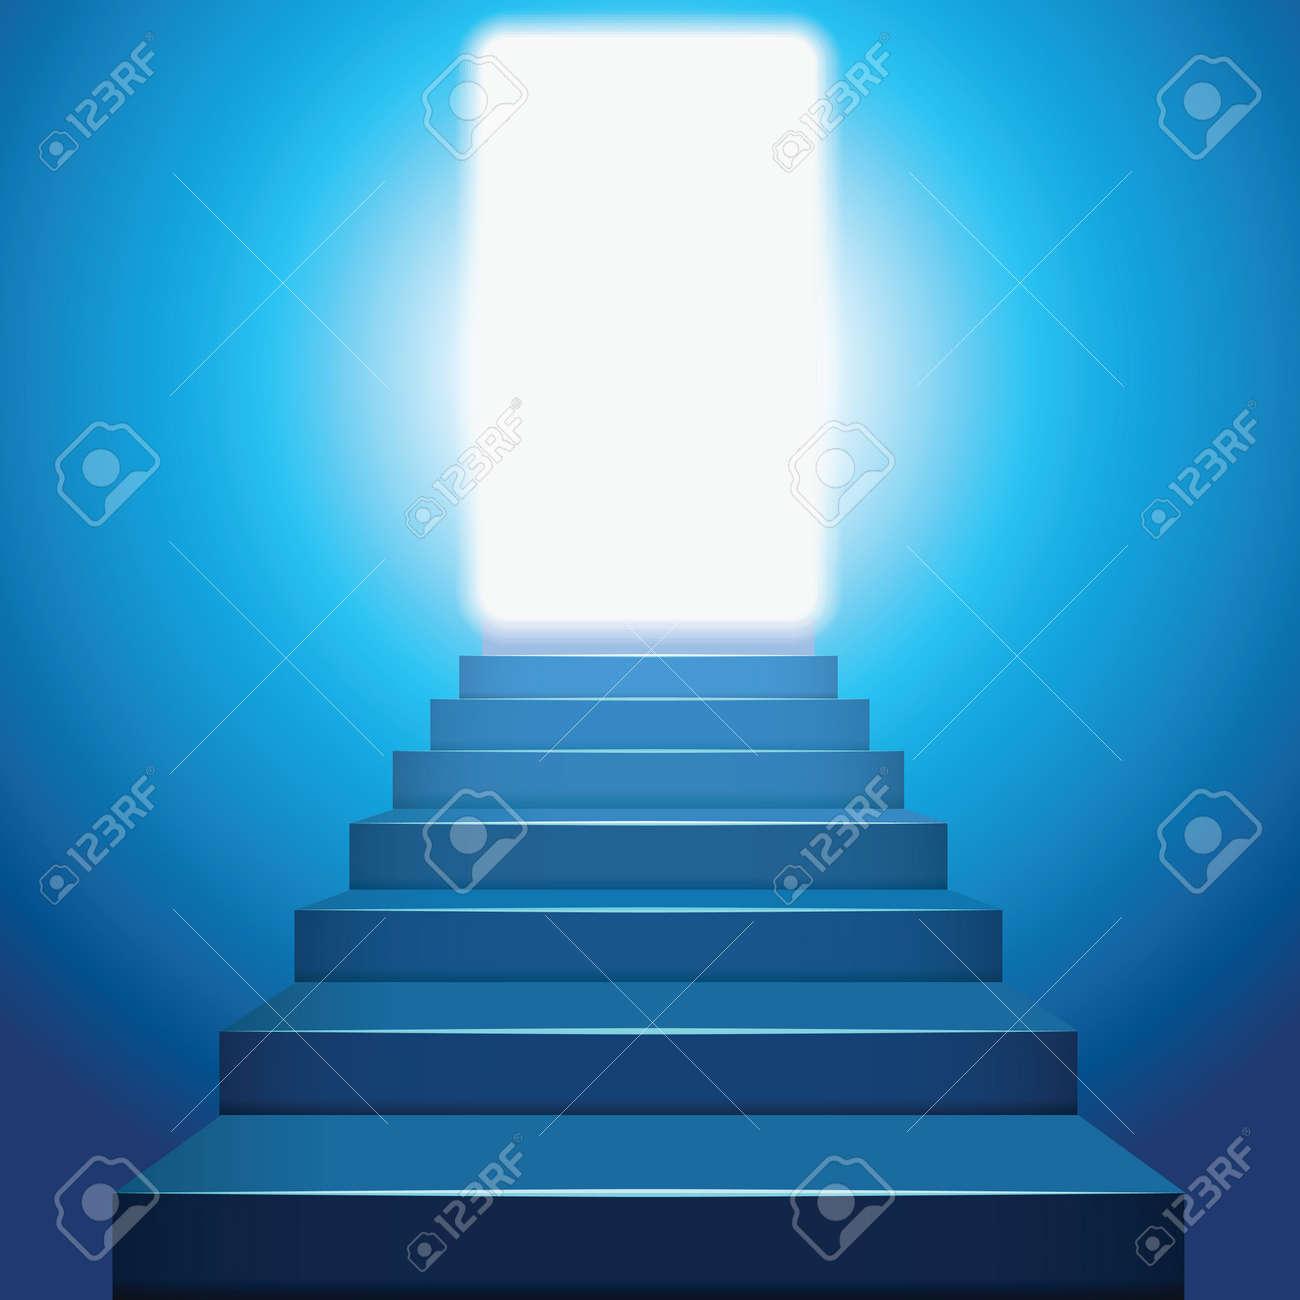 Stairway to heaven in the light. Stock Vector - 10823665